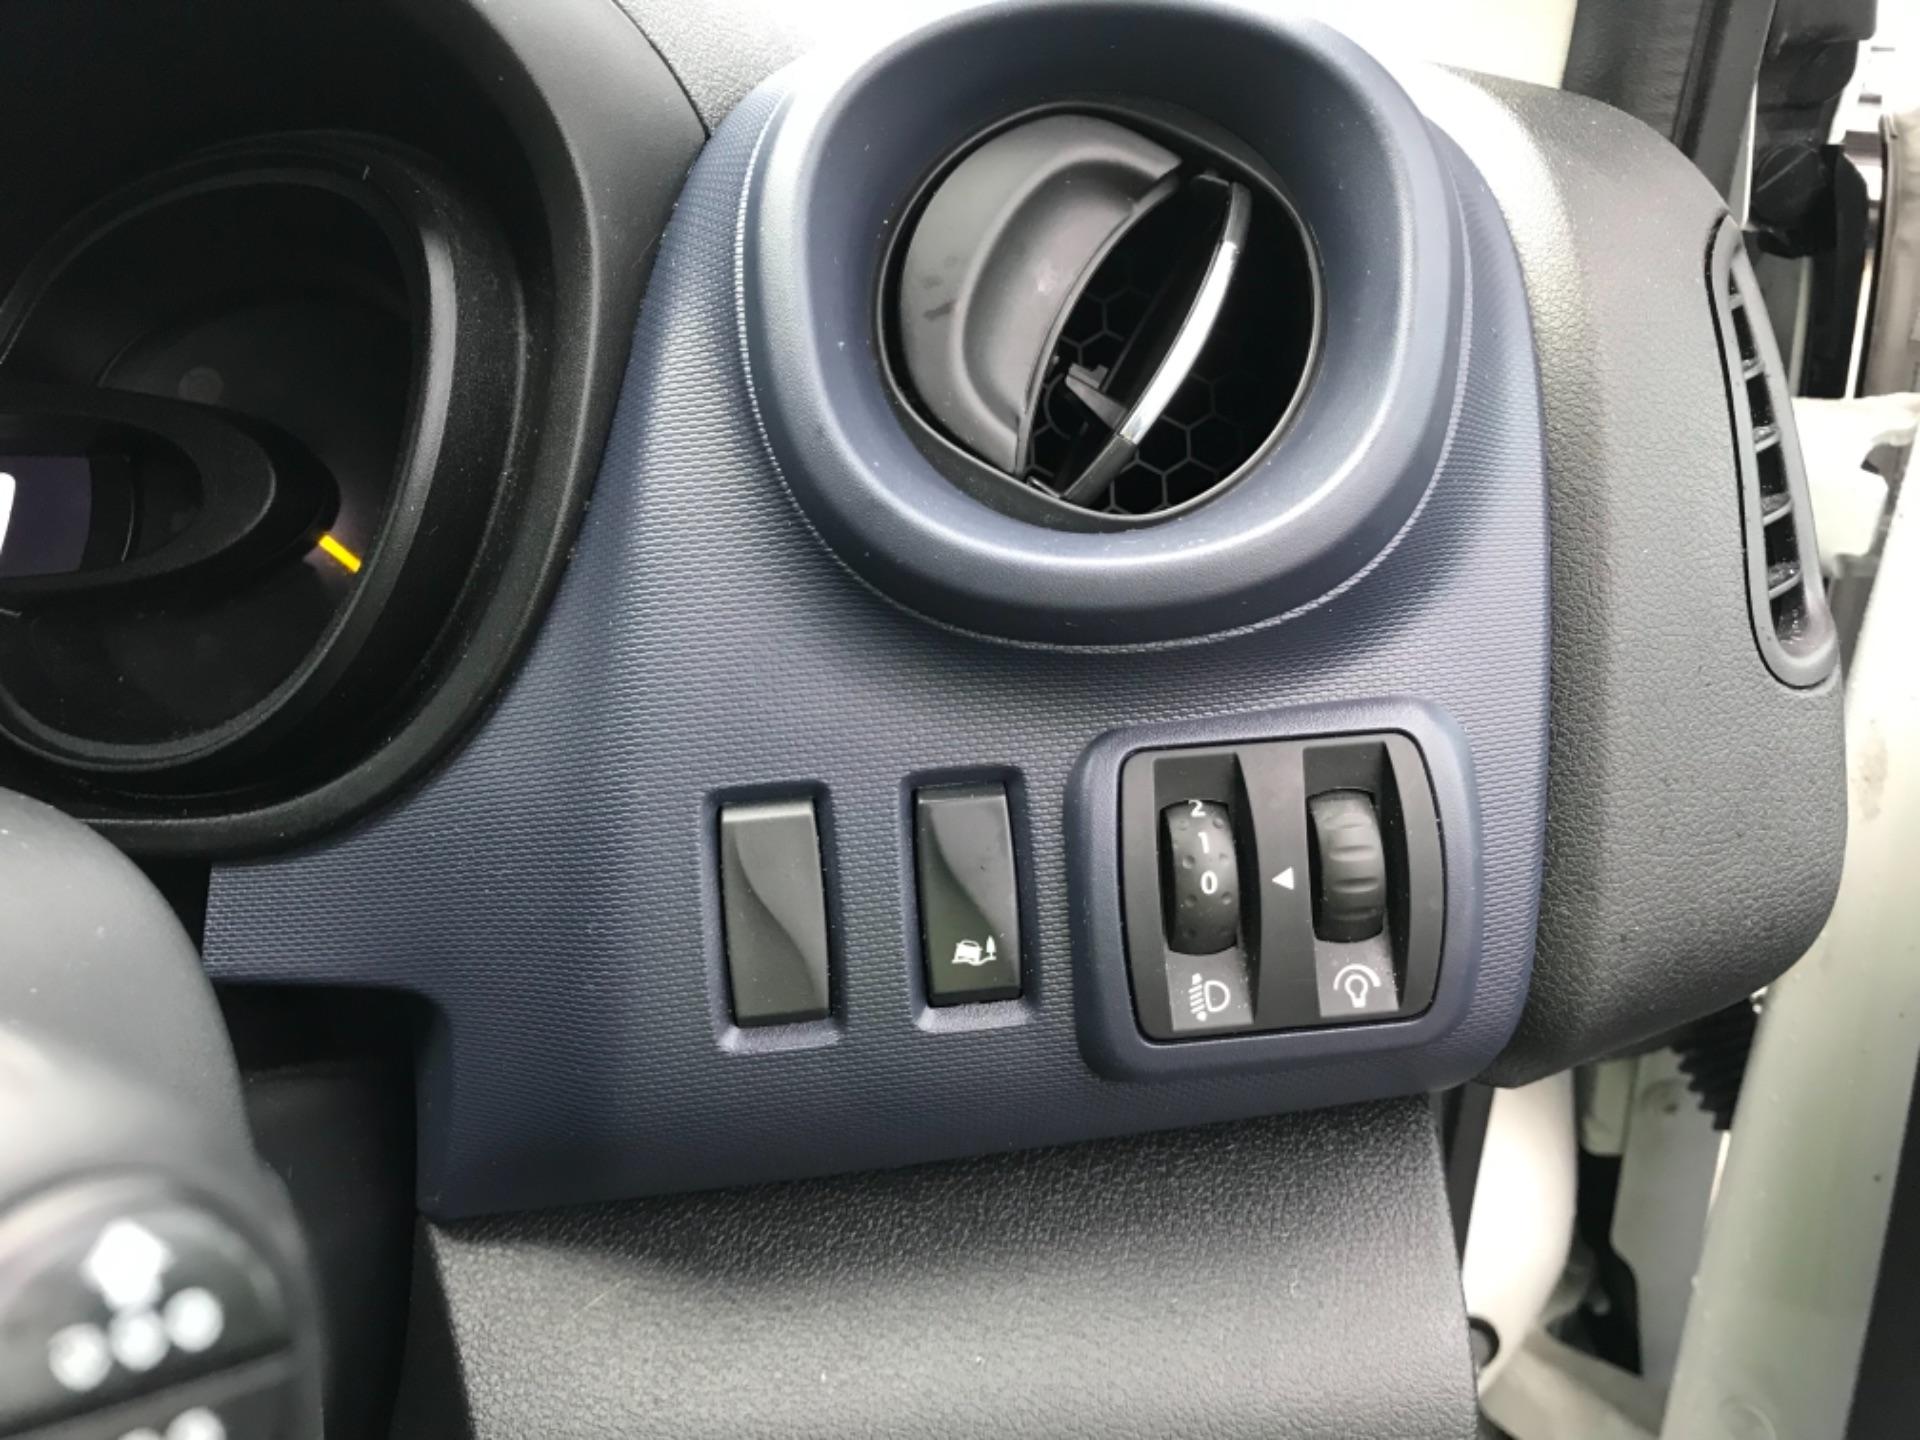 2017 Vauxhall Vivaro 2900 1.6Cdti Biturbo 125Ps H1 Combi 9 Seat Euro 6 (DY17UGF) Image 19